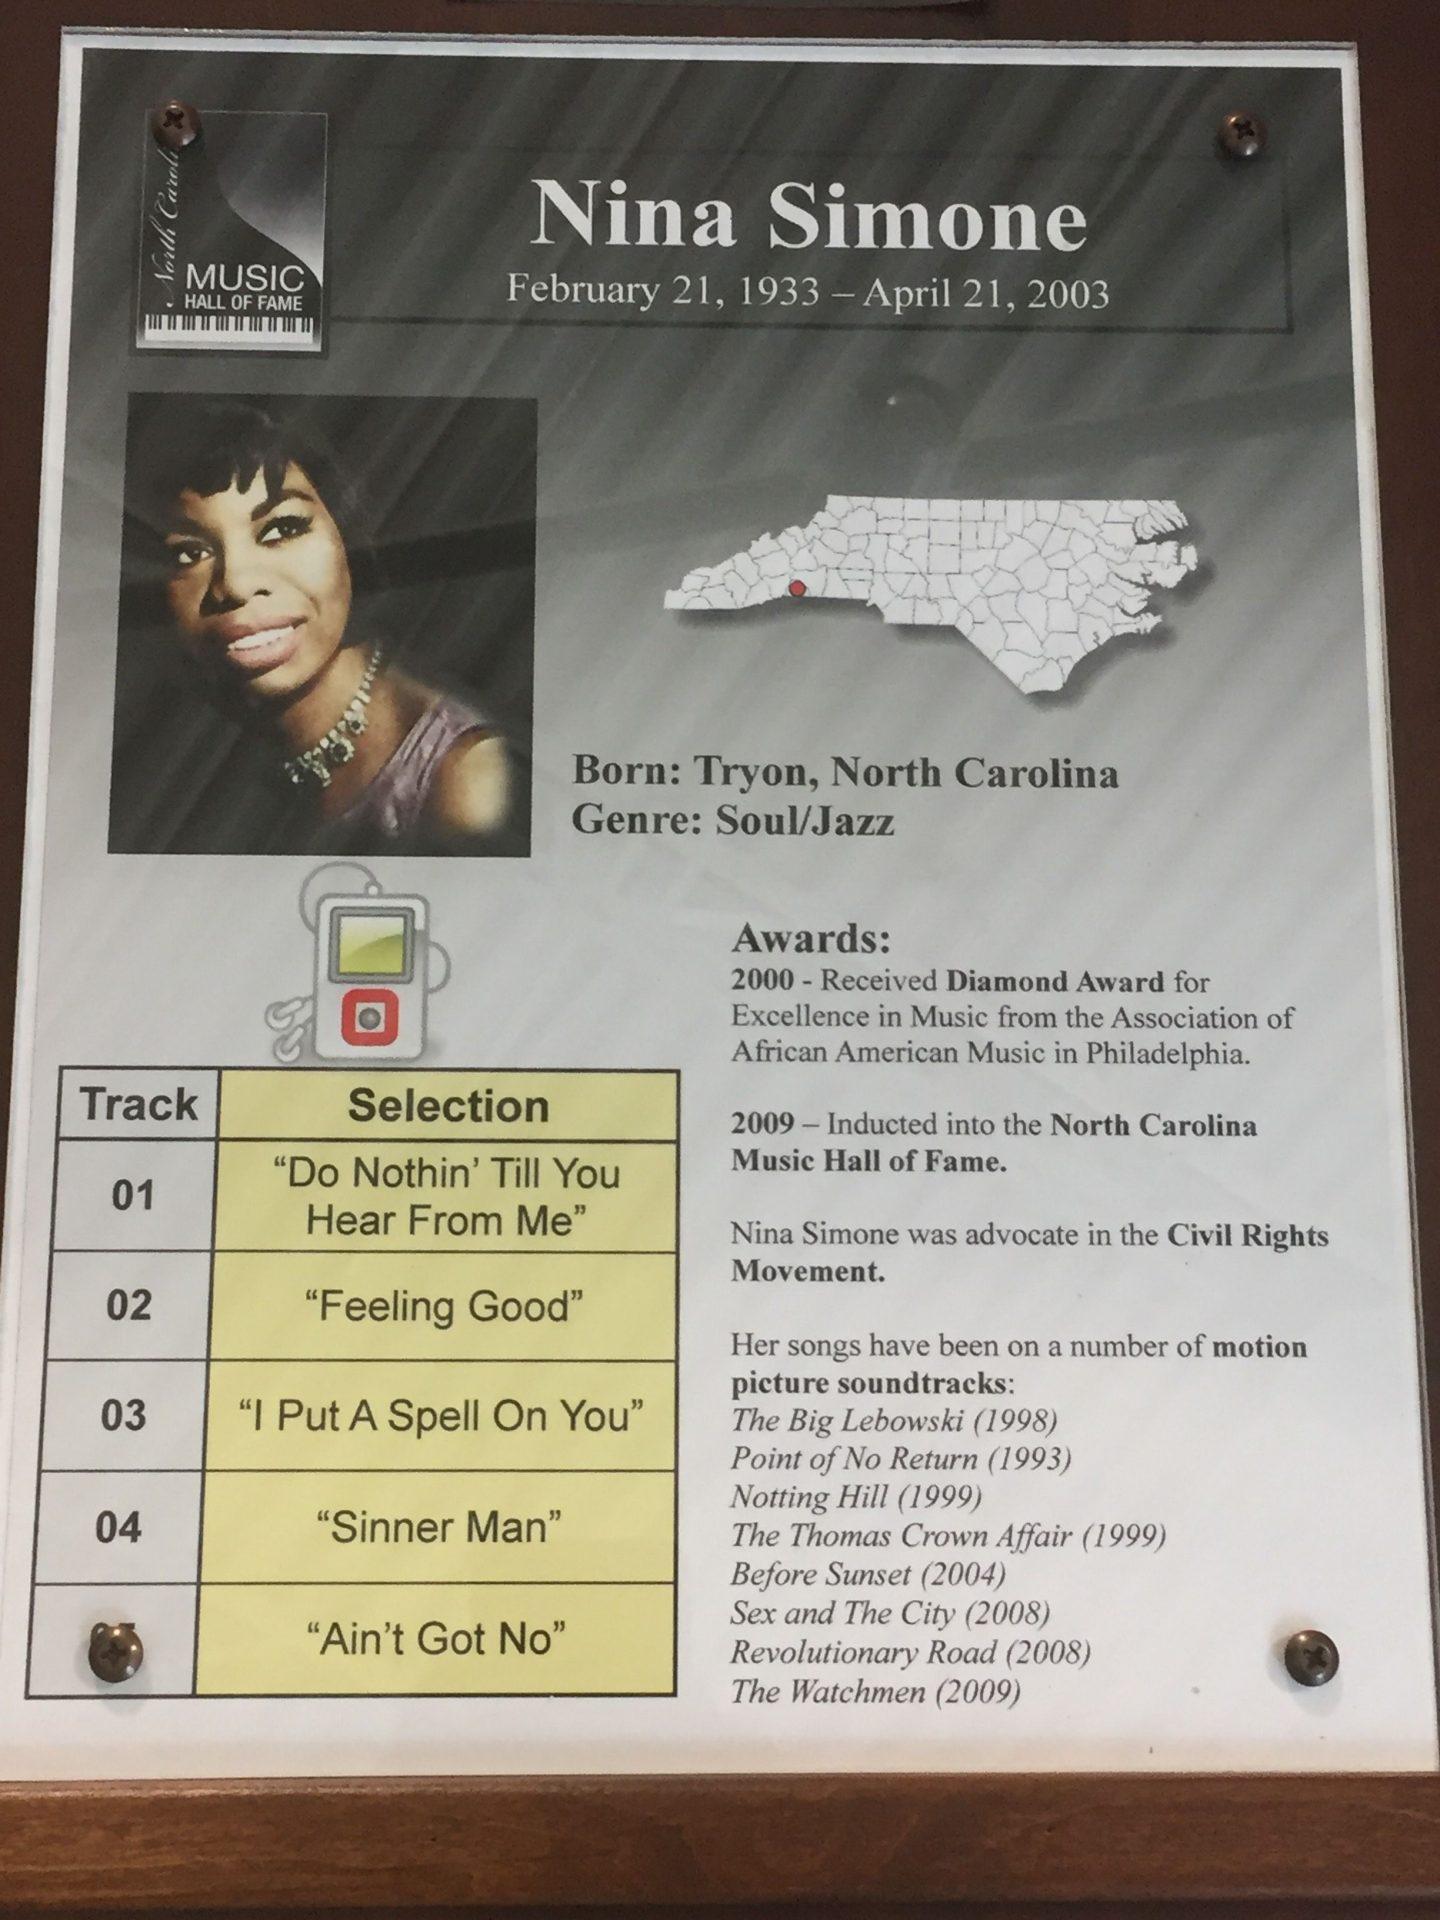 IMG_0672-1440x1920 Nina Simone: A North Carolina Legend and Hall of Famer